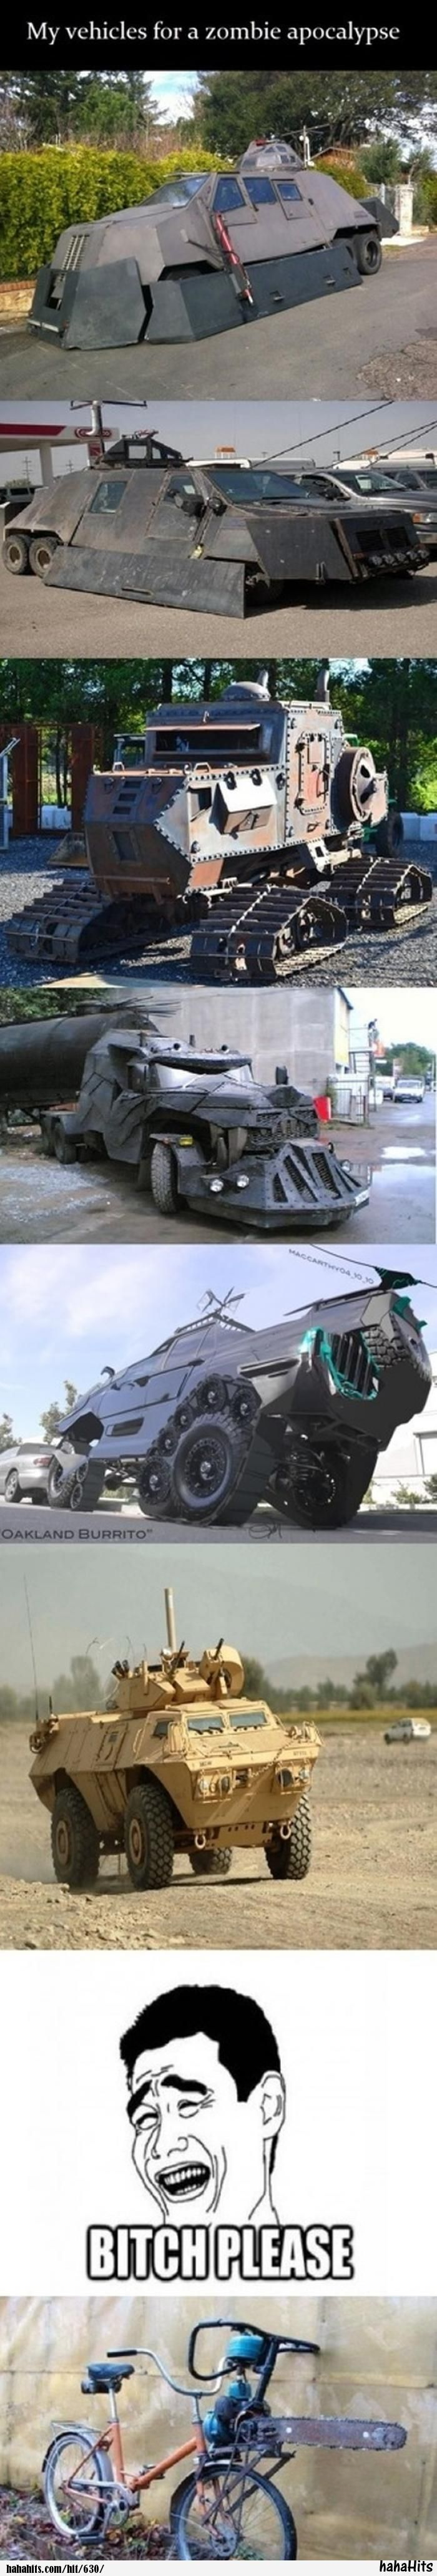 Vehicles for a Zombie Apocalypse